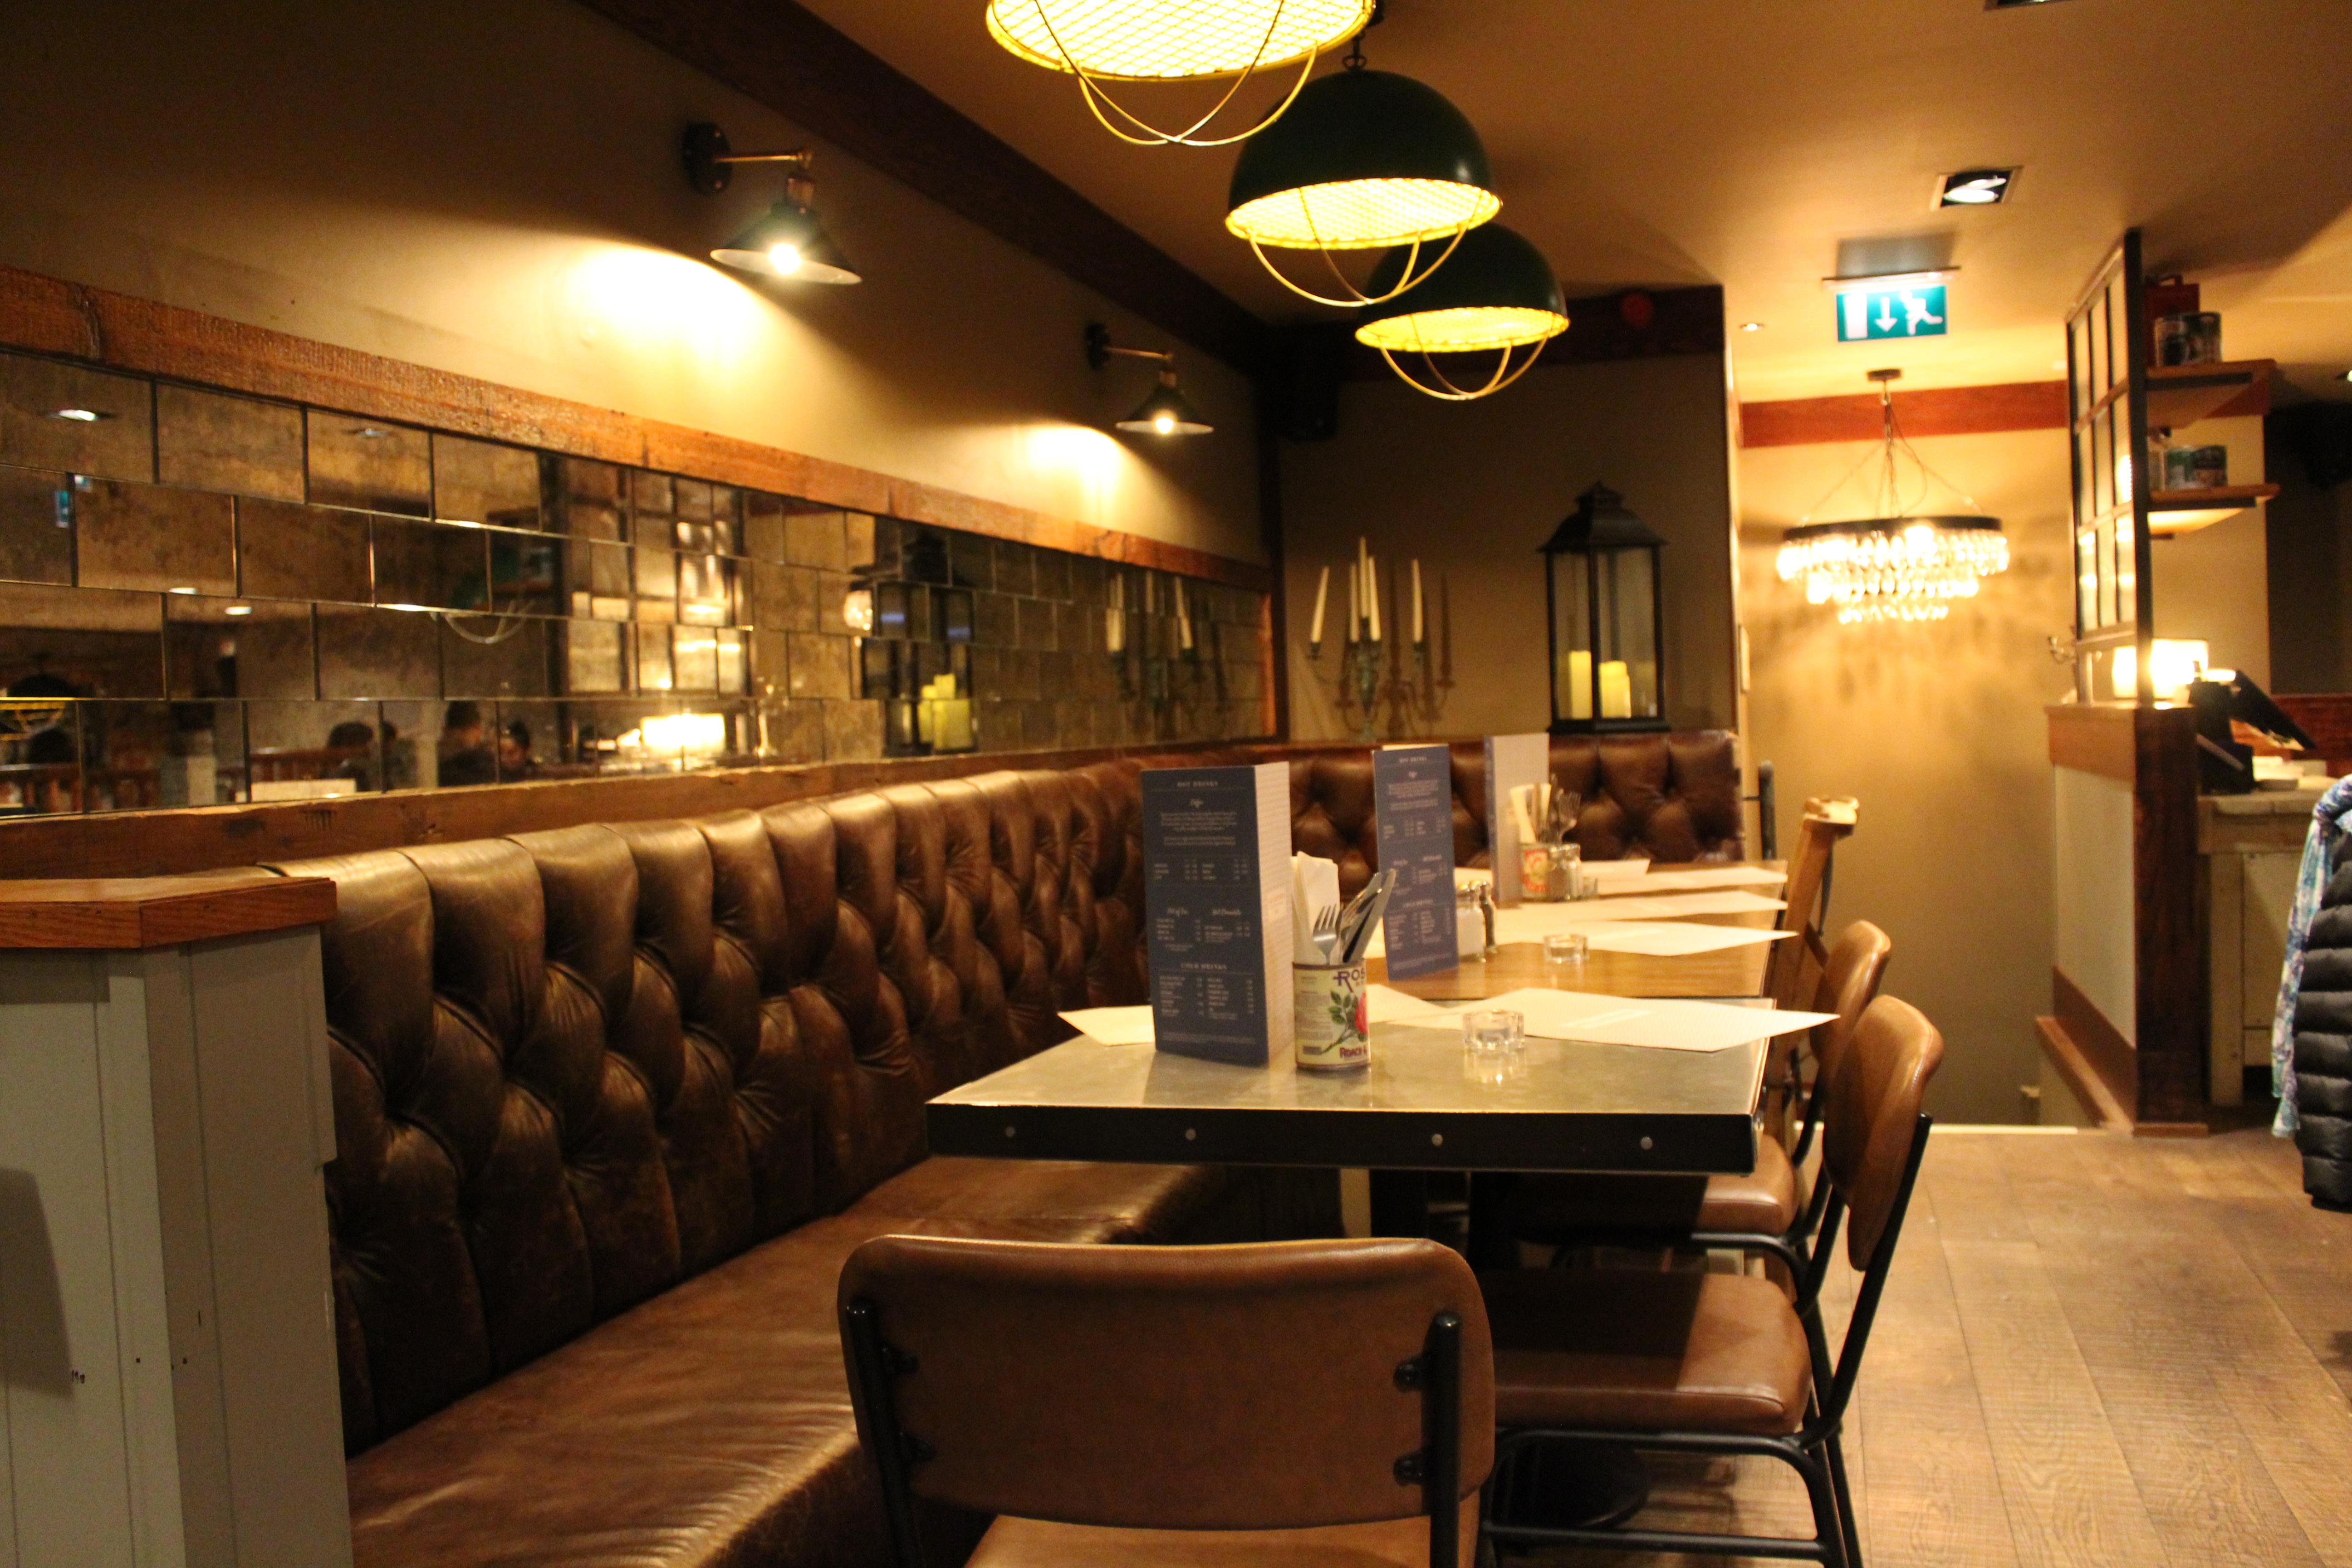 Joe S Kitchen Ludgate Hill